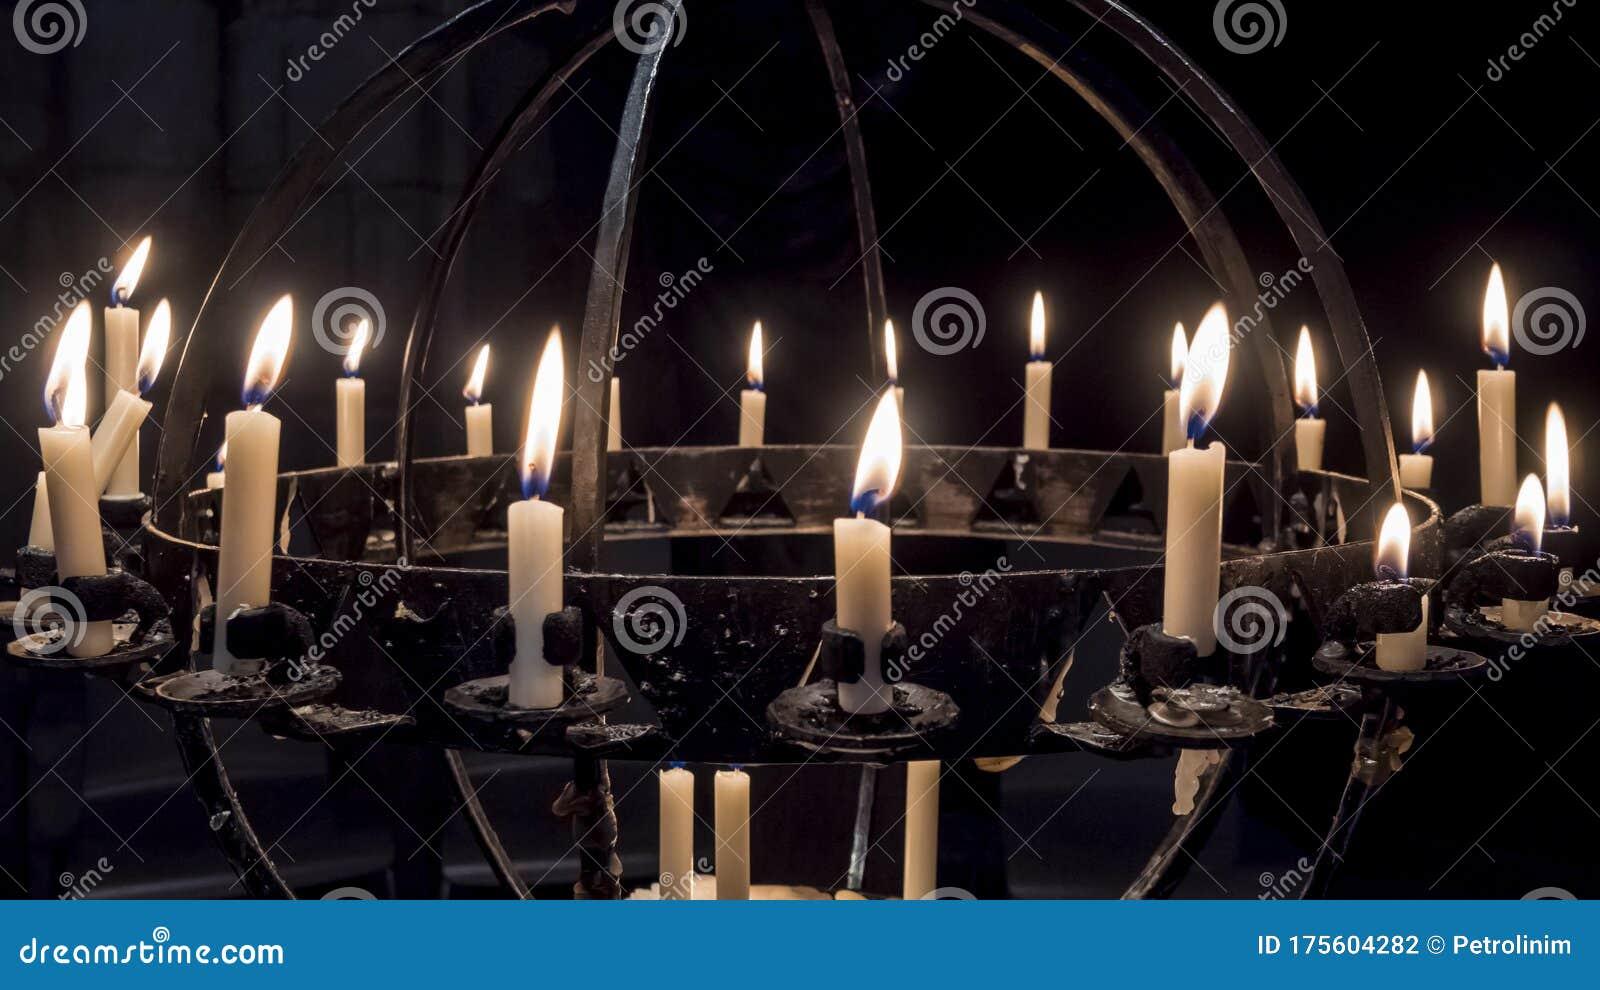 Wrought Iron Candle Holder Inside The Frauenkirche Nuremberg Stock Photo Image Of Bavaria Castle 175604282